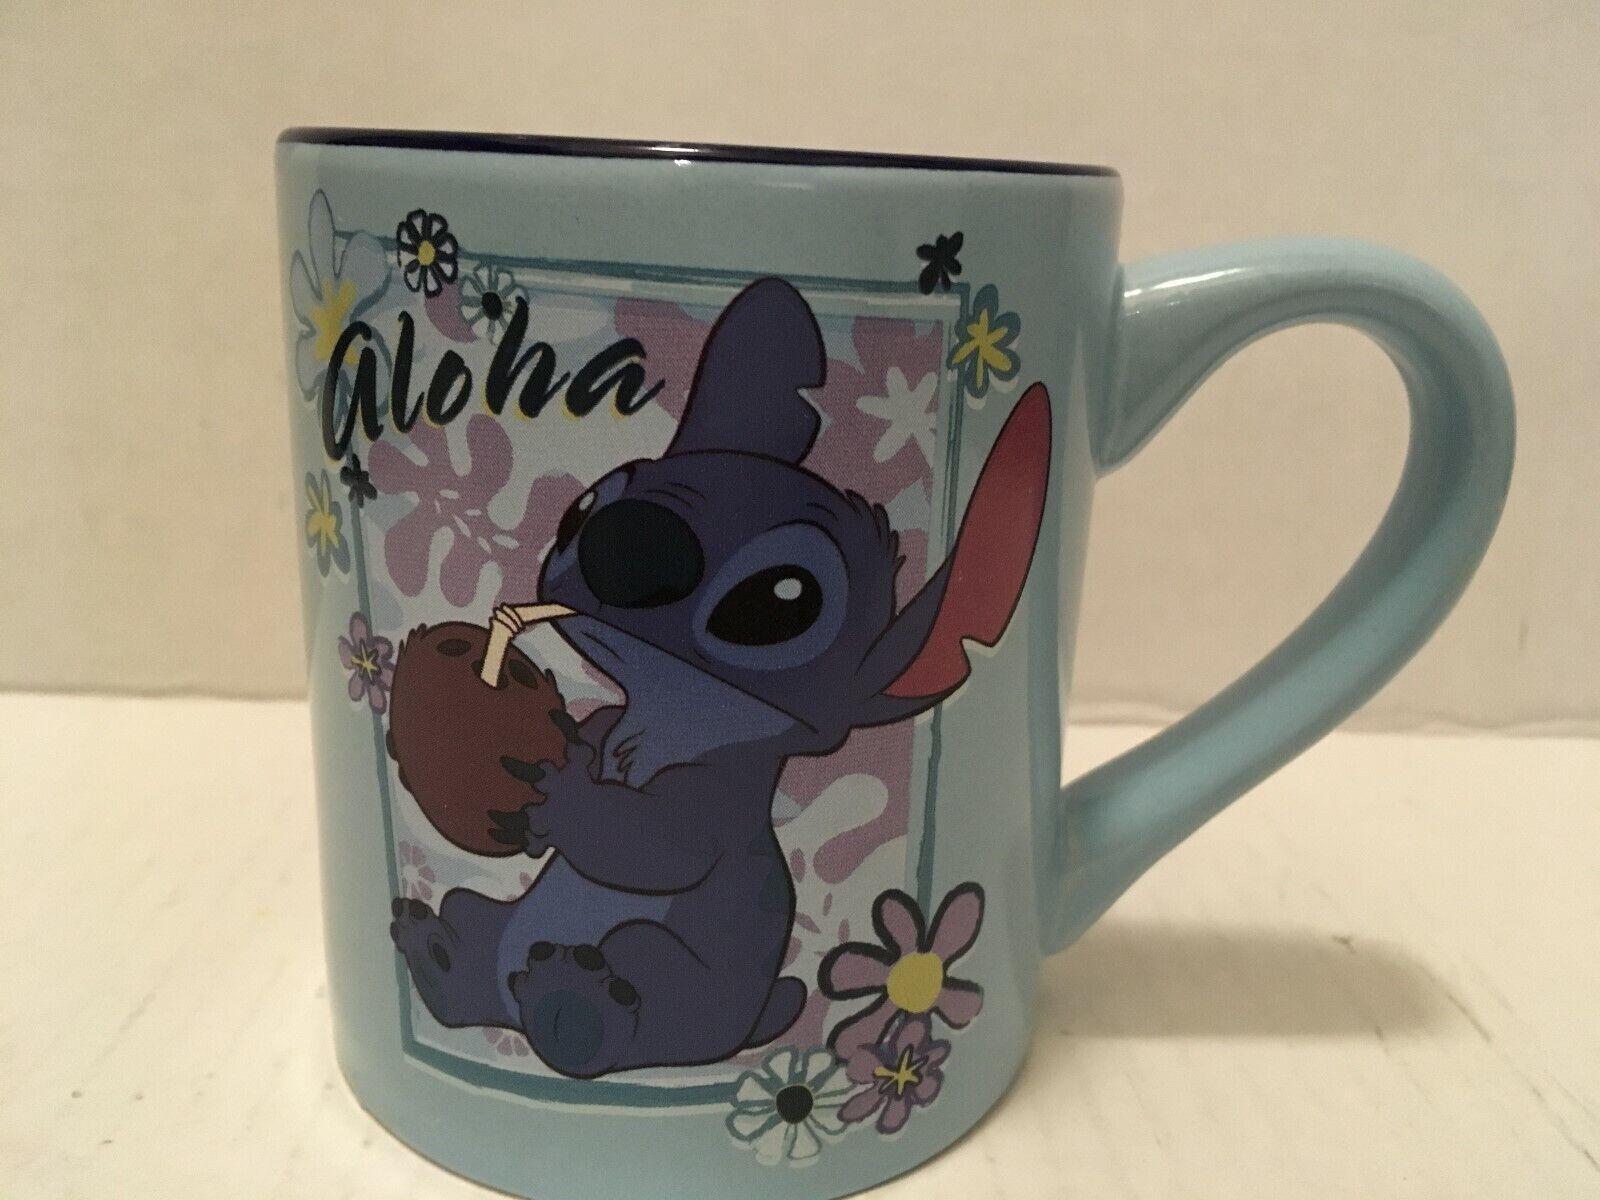 Disney Store Stitch Coffee Mug 10 Oz - Lilo & Stitch - Micro